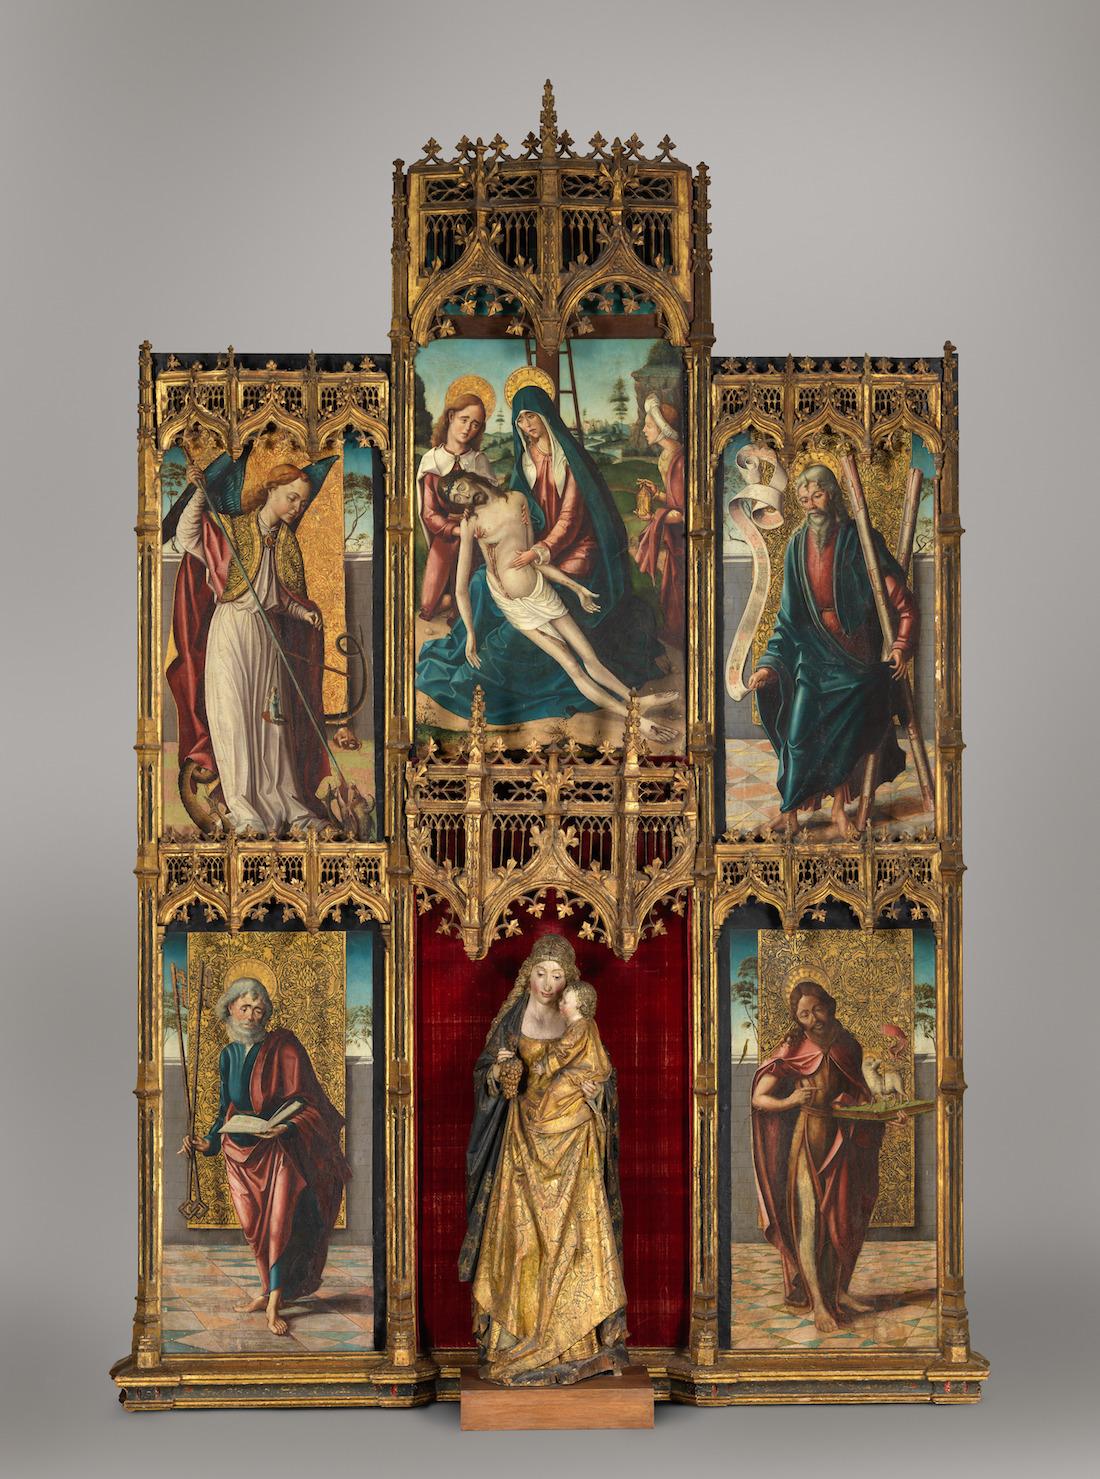 Spanish (Castilian) Painter (late 15th century) via the MET